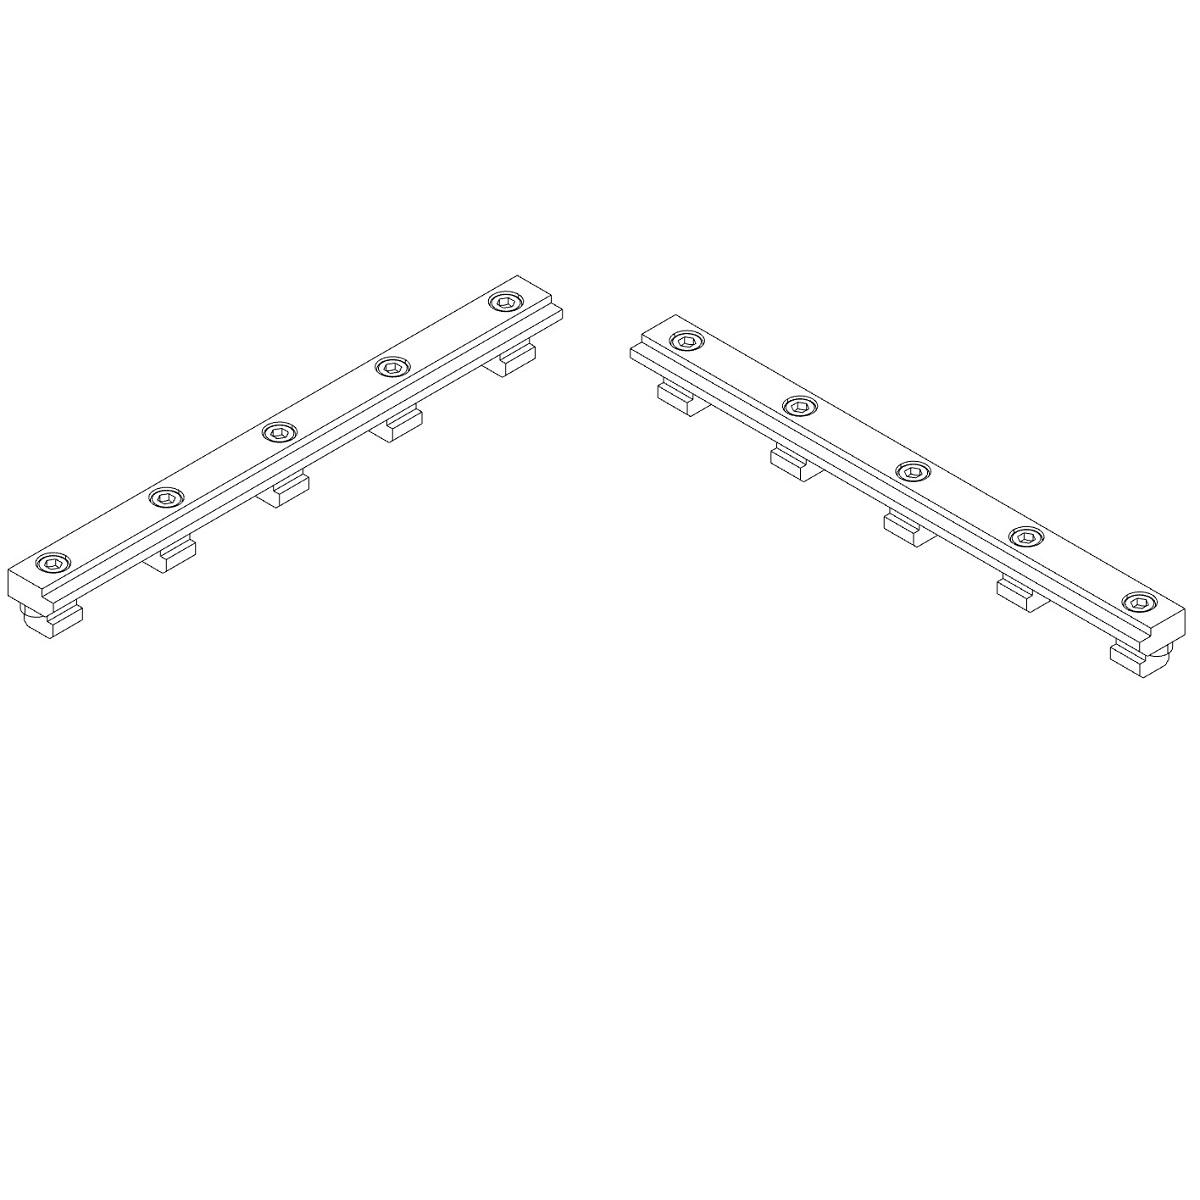 30771 isel stop rails set of 2 b20 x h10 x l225mm tnuts 3d render